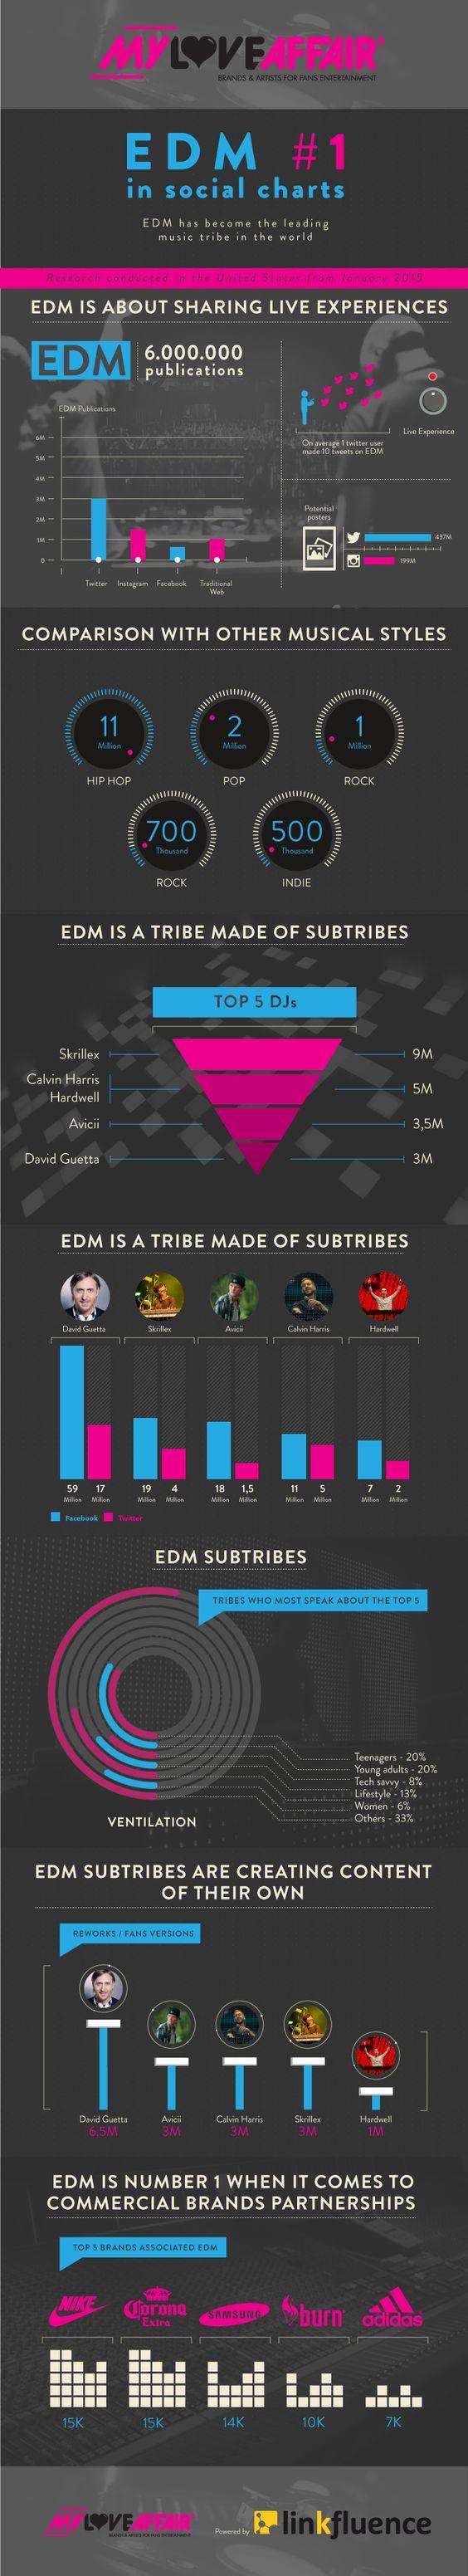 Infographie EDM My Love Affair Linkfluence